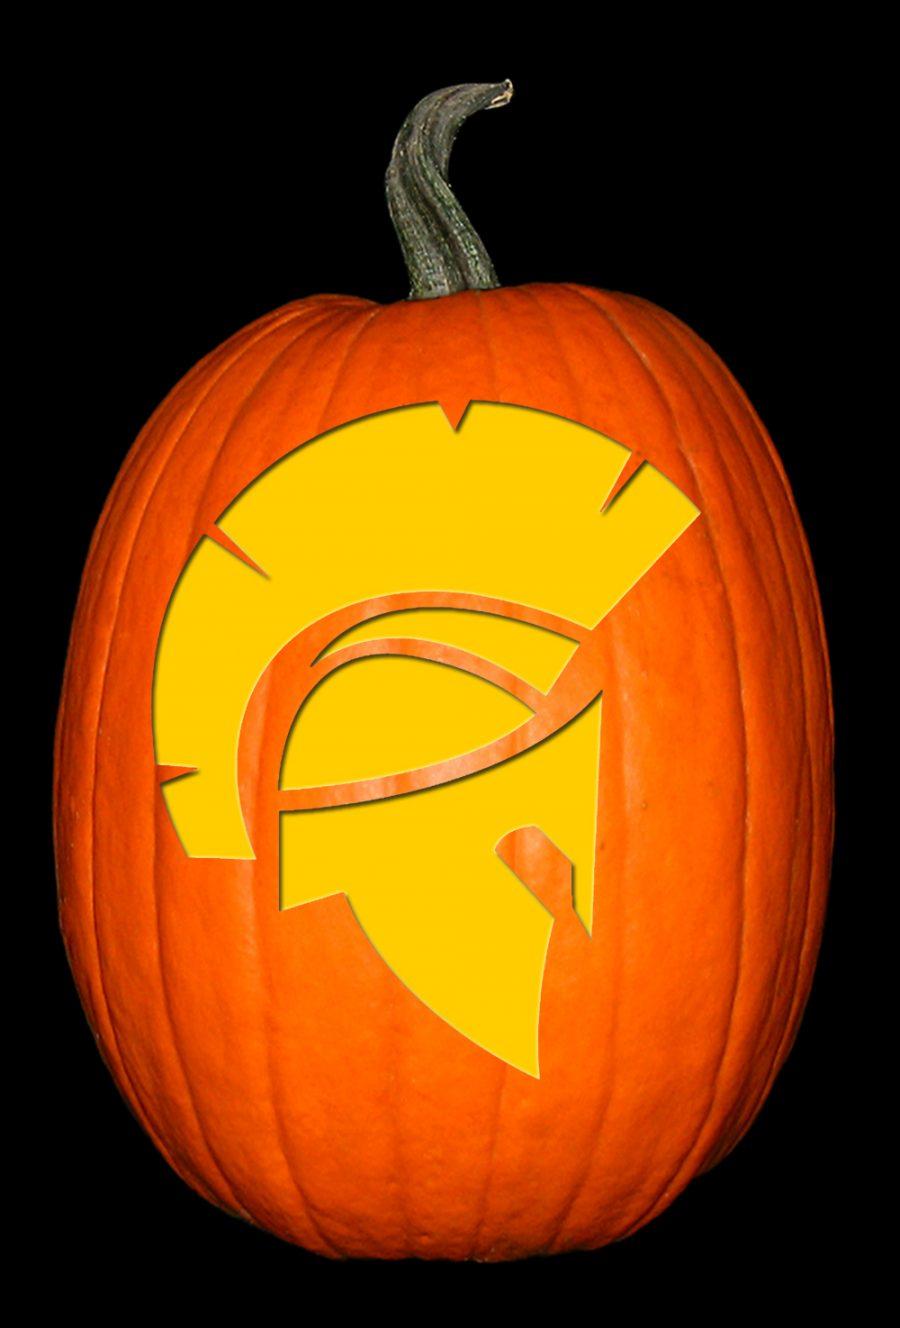 Sparta NJ Emblem Pumpkin